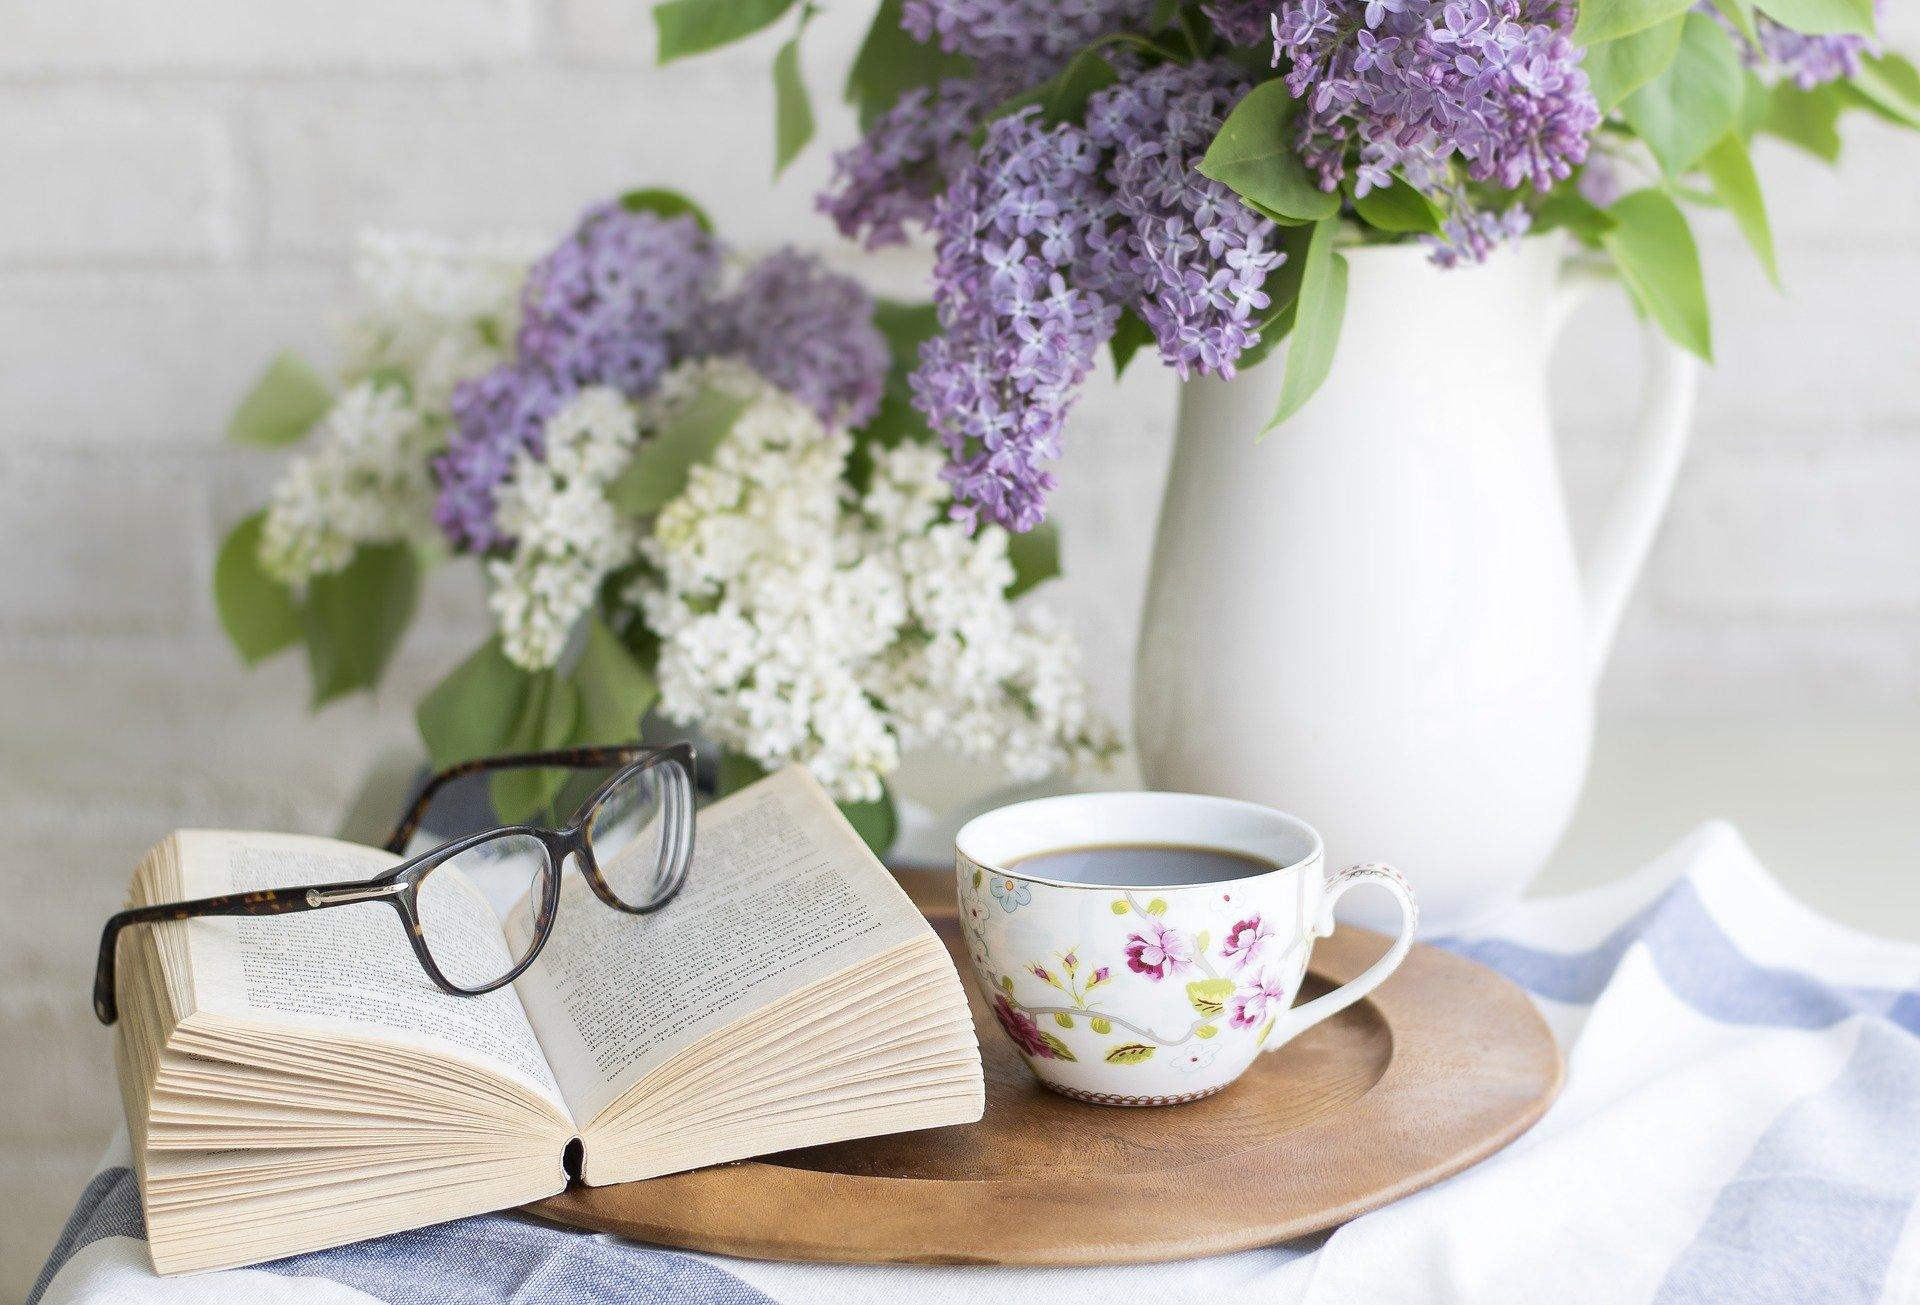 tea book glasses